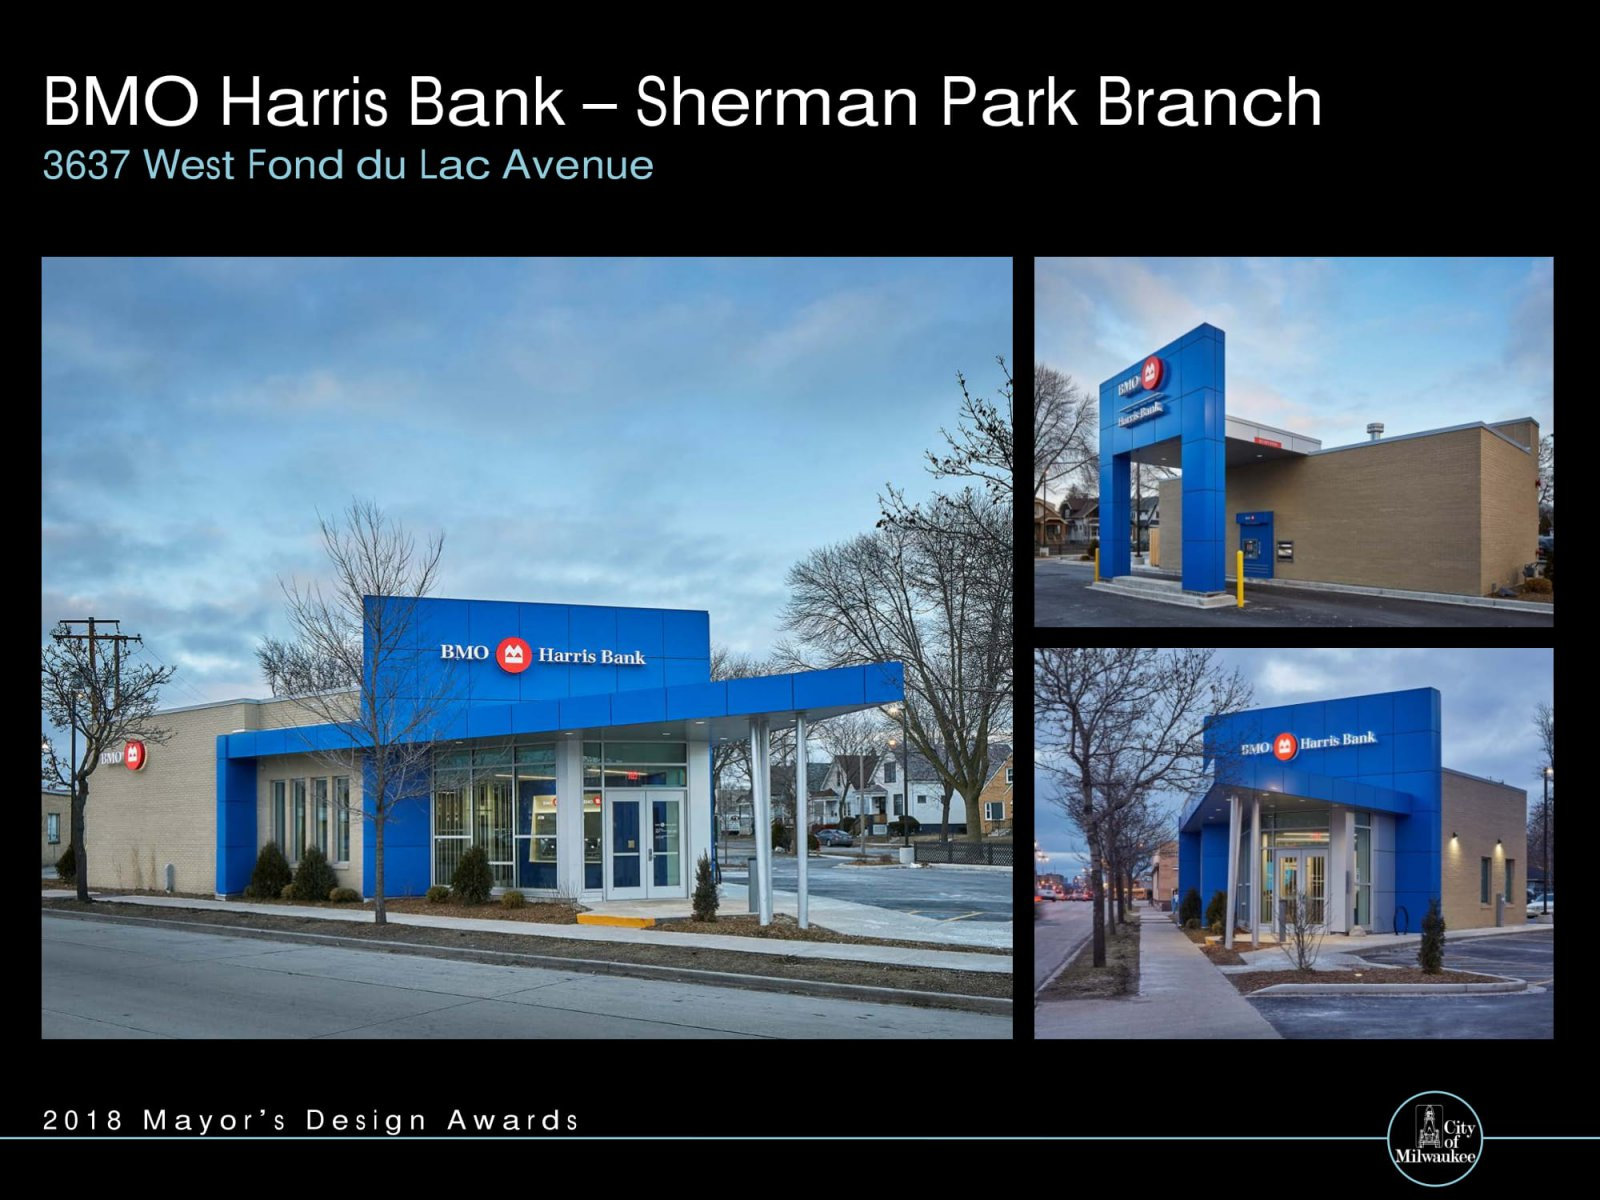 BMO Harris Bank Sherman Park